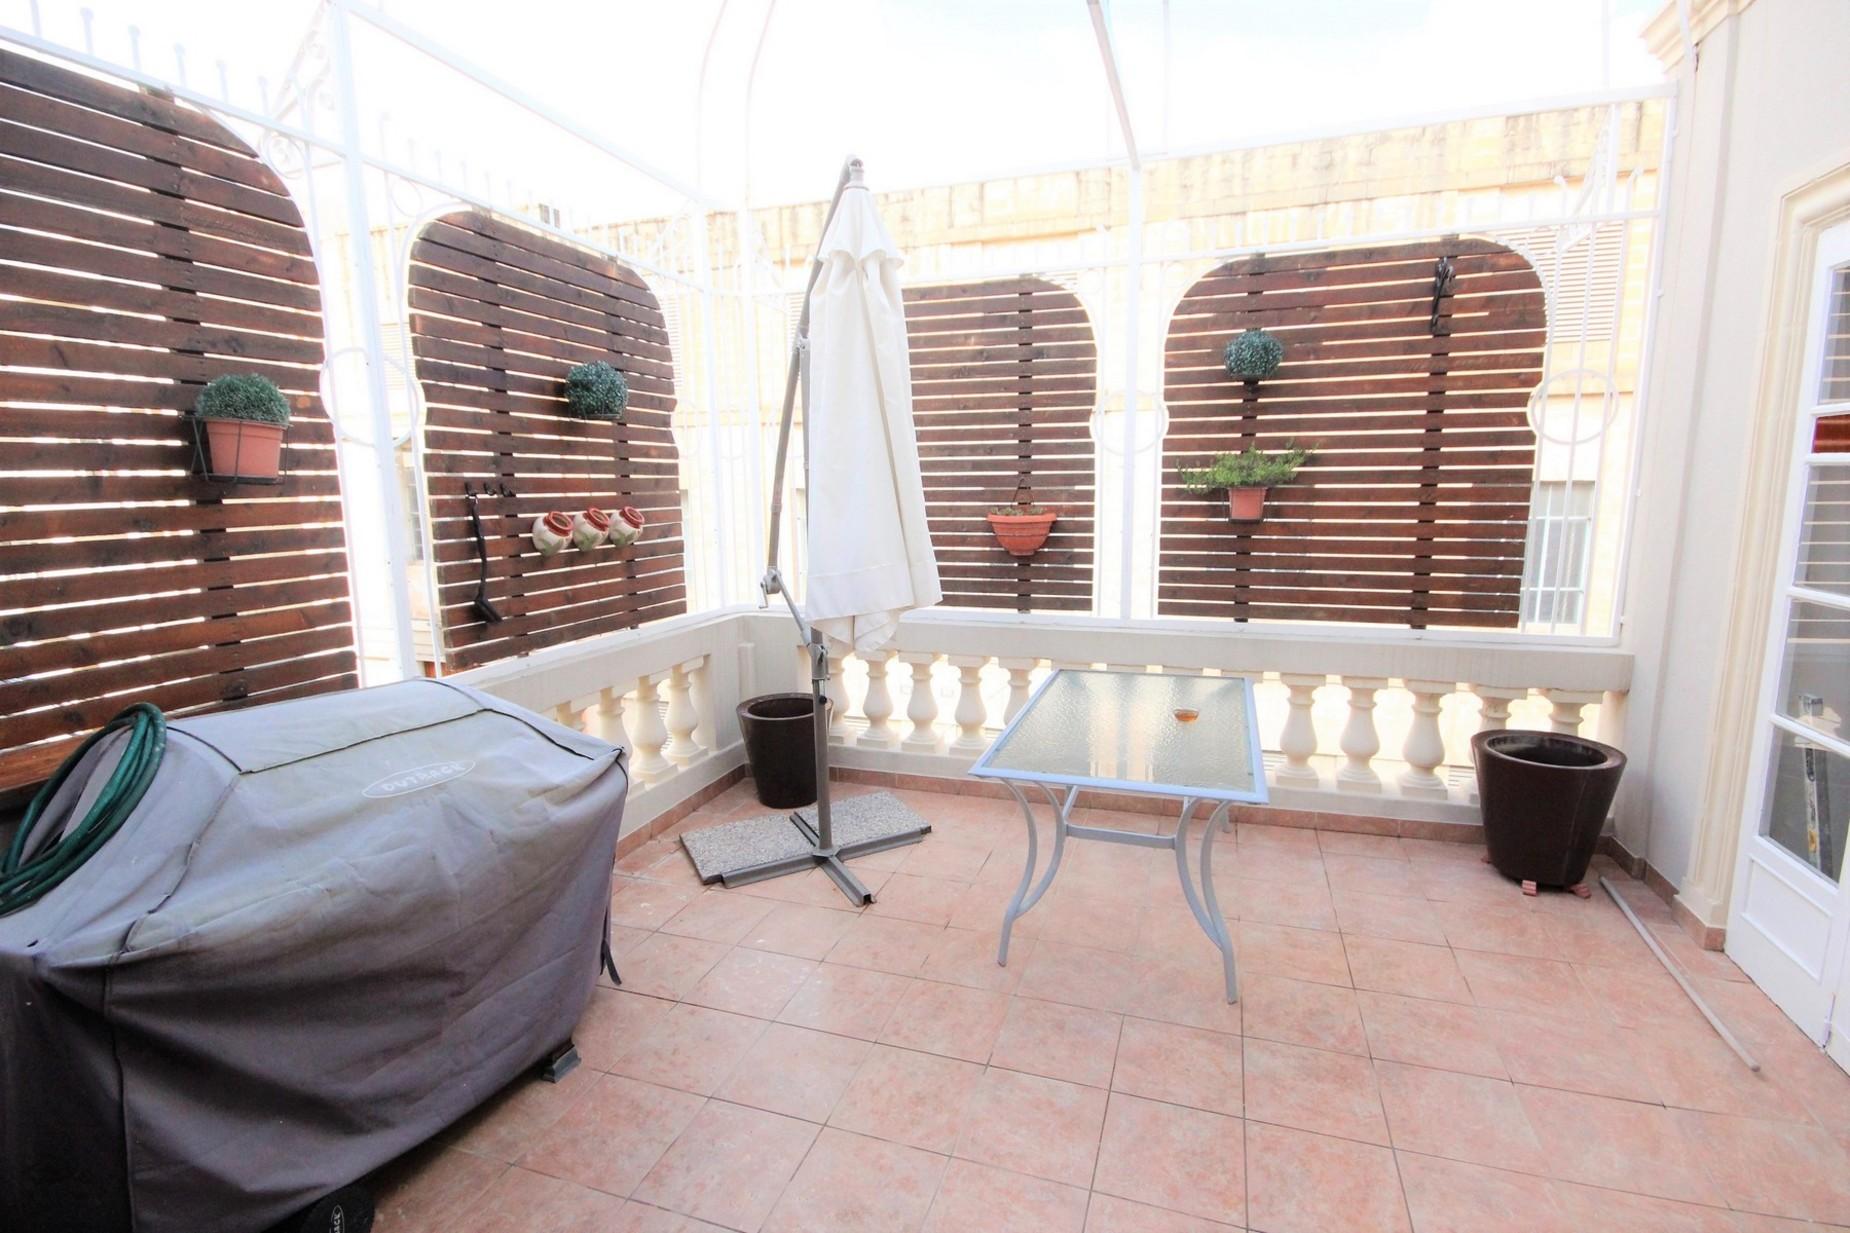 3 bed Town House For Rent in Gzira, Gzira - thumb 11